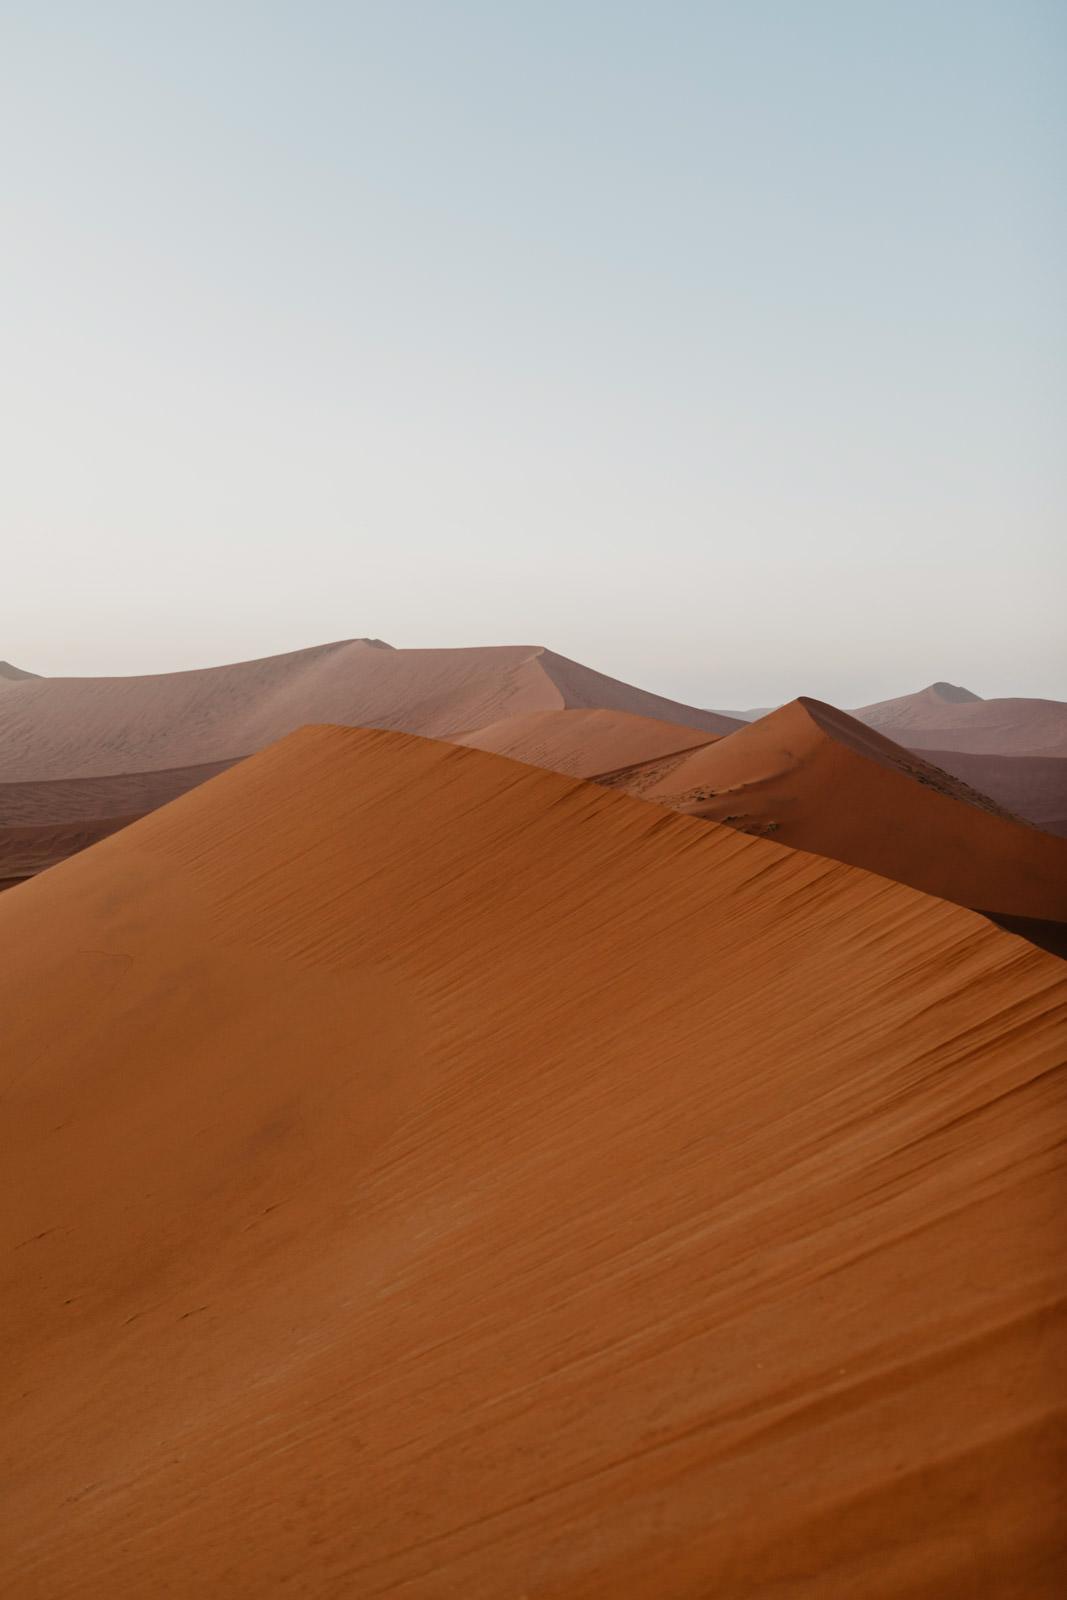 namibia_trip_rooftent_camping_roadtrip (7 von 26).jpg